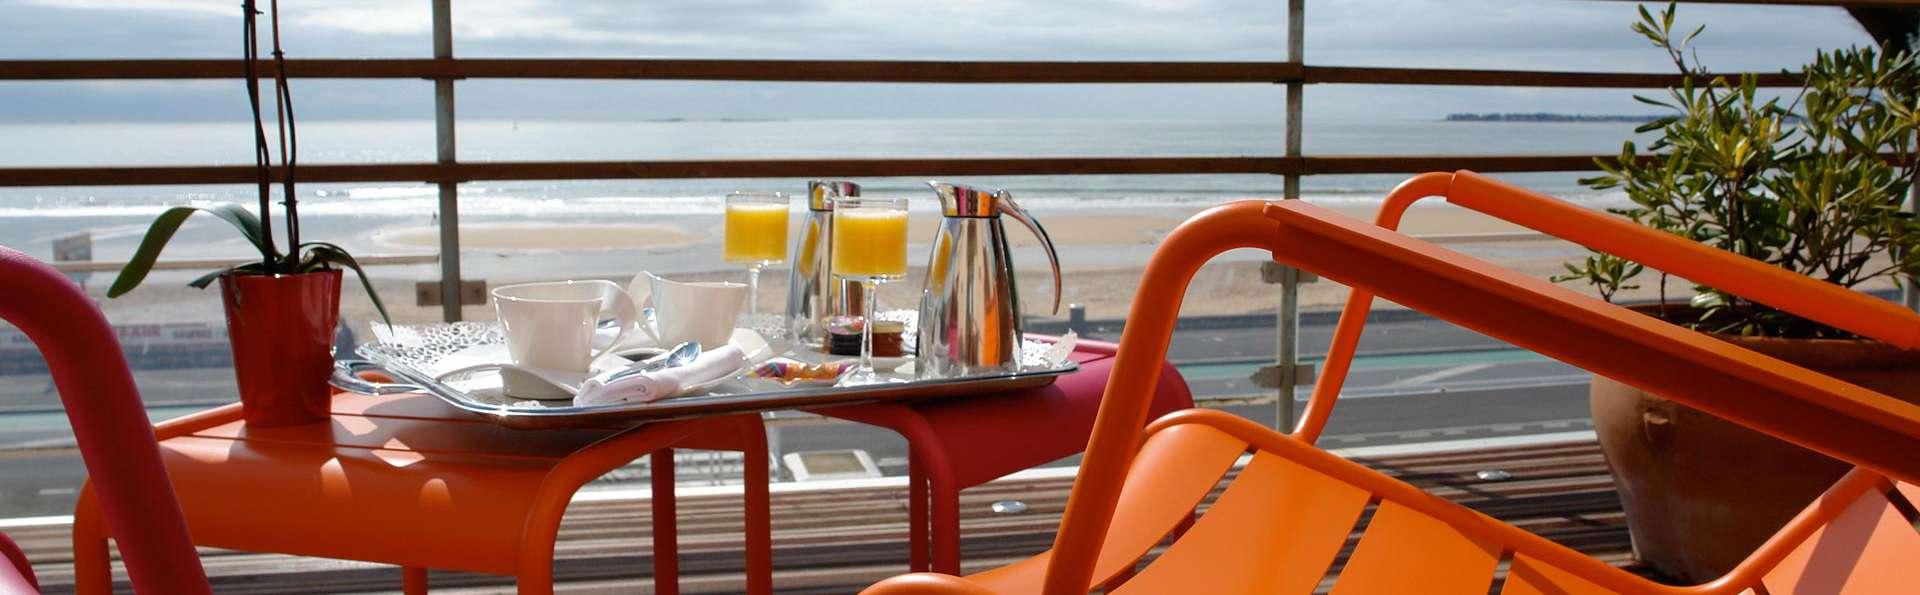 Le Régent et Spa - EDIT_breakfasterrace.jpg